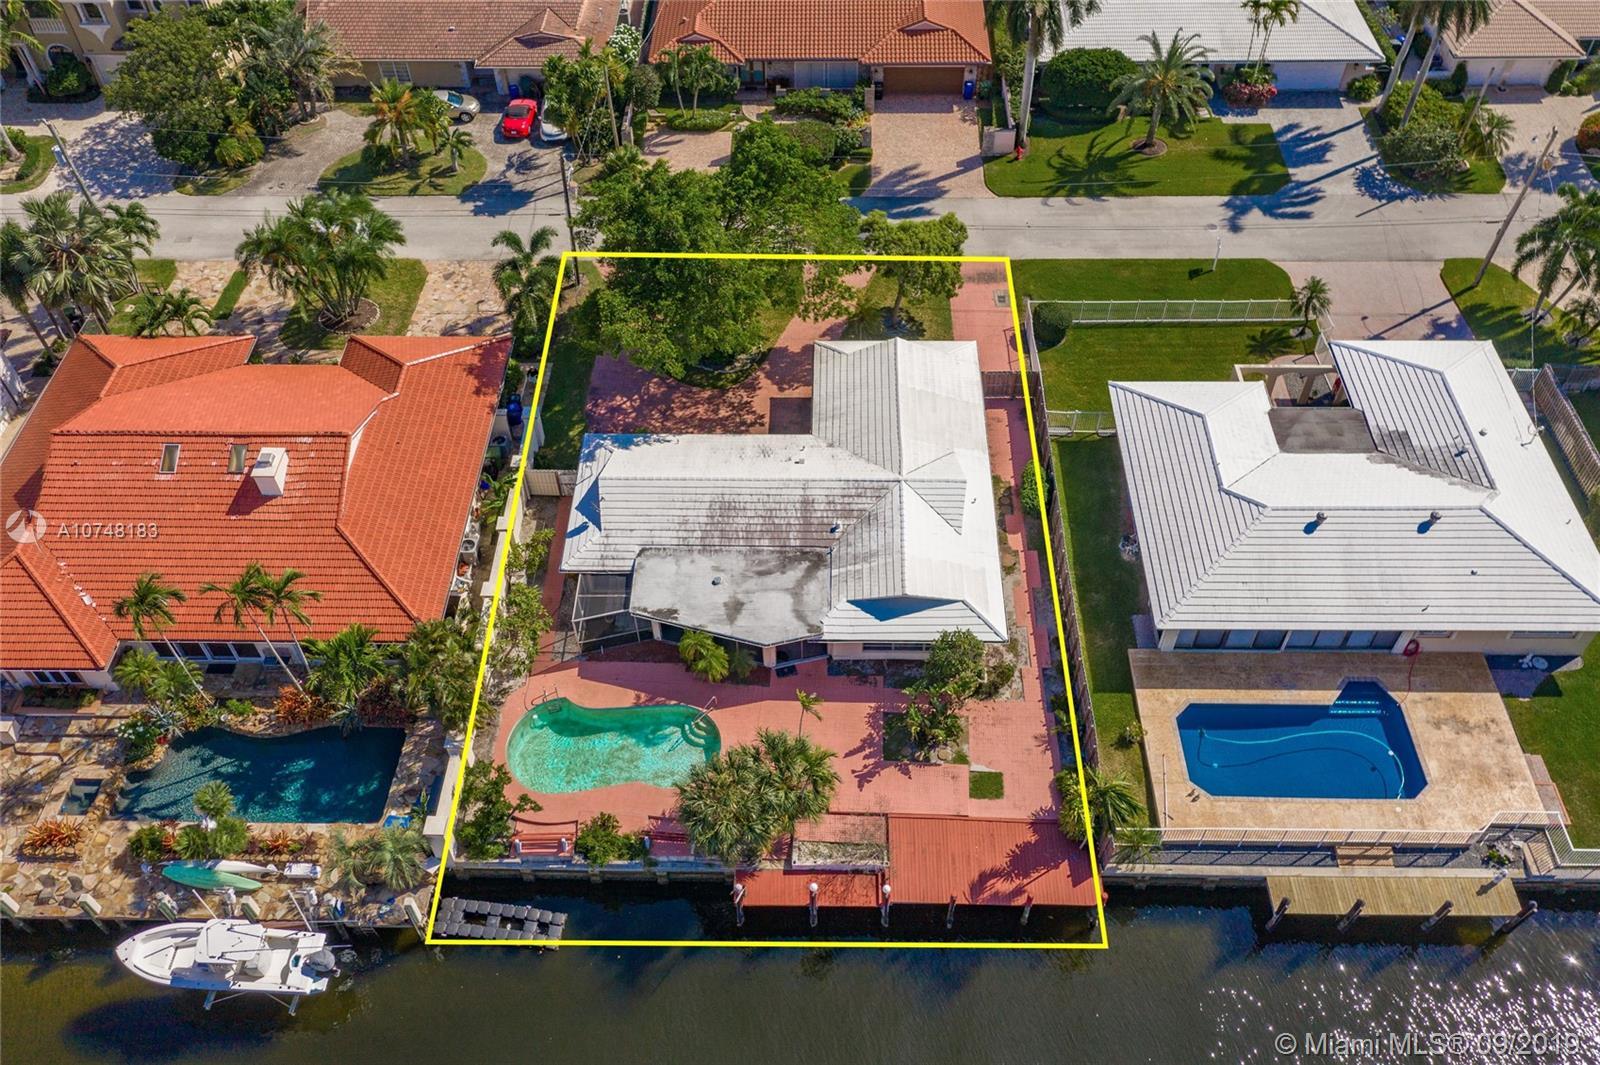 3041 NE 40th St - Fort Lauderdale, Florida